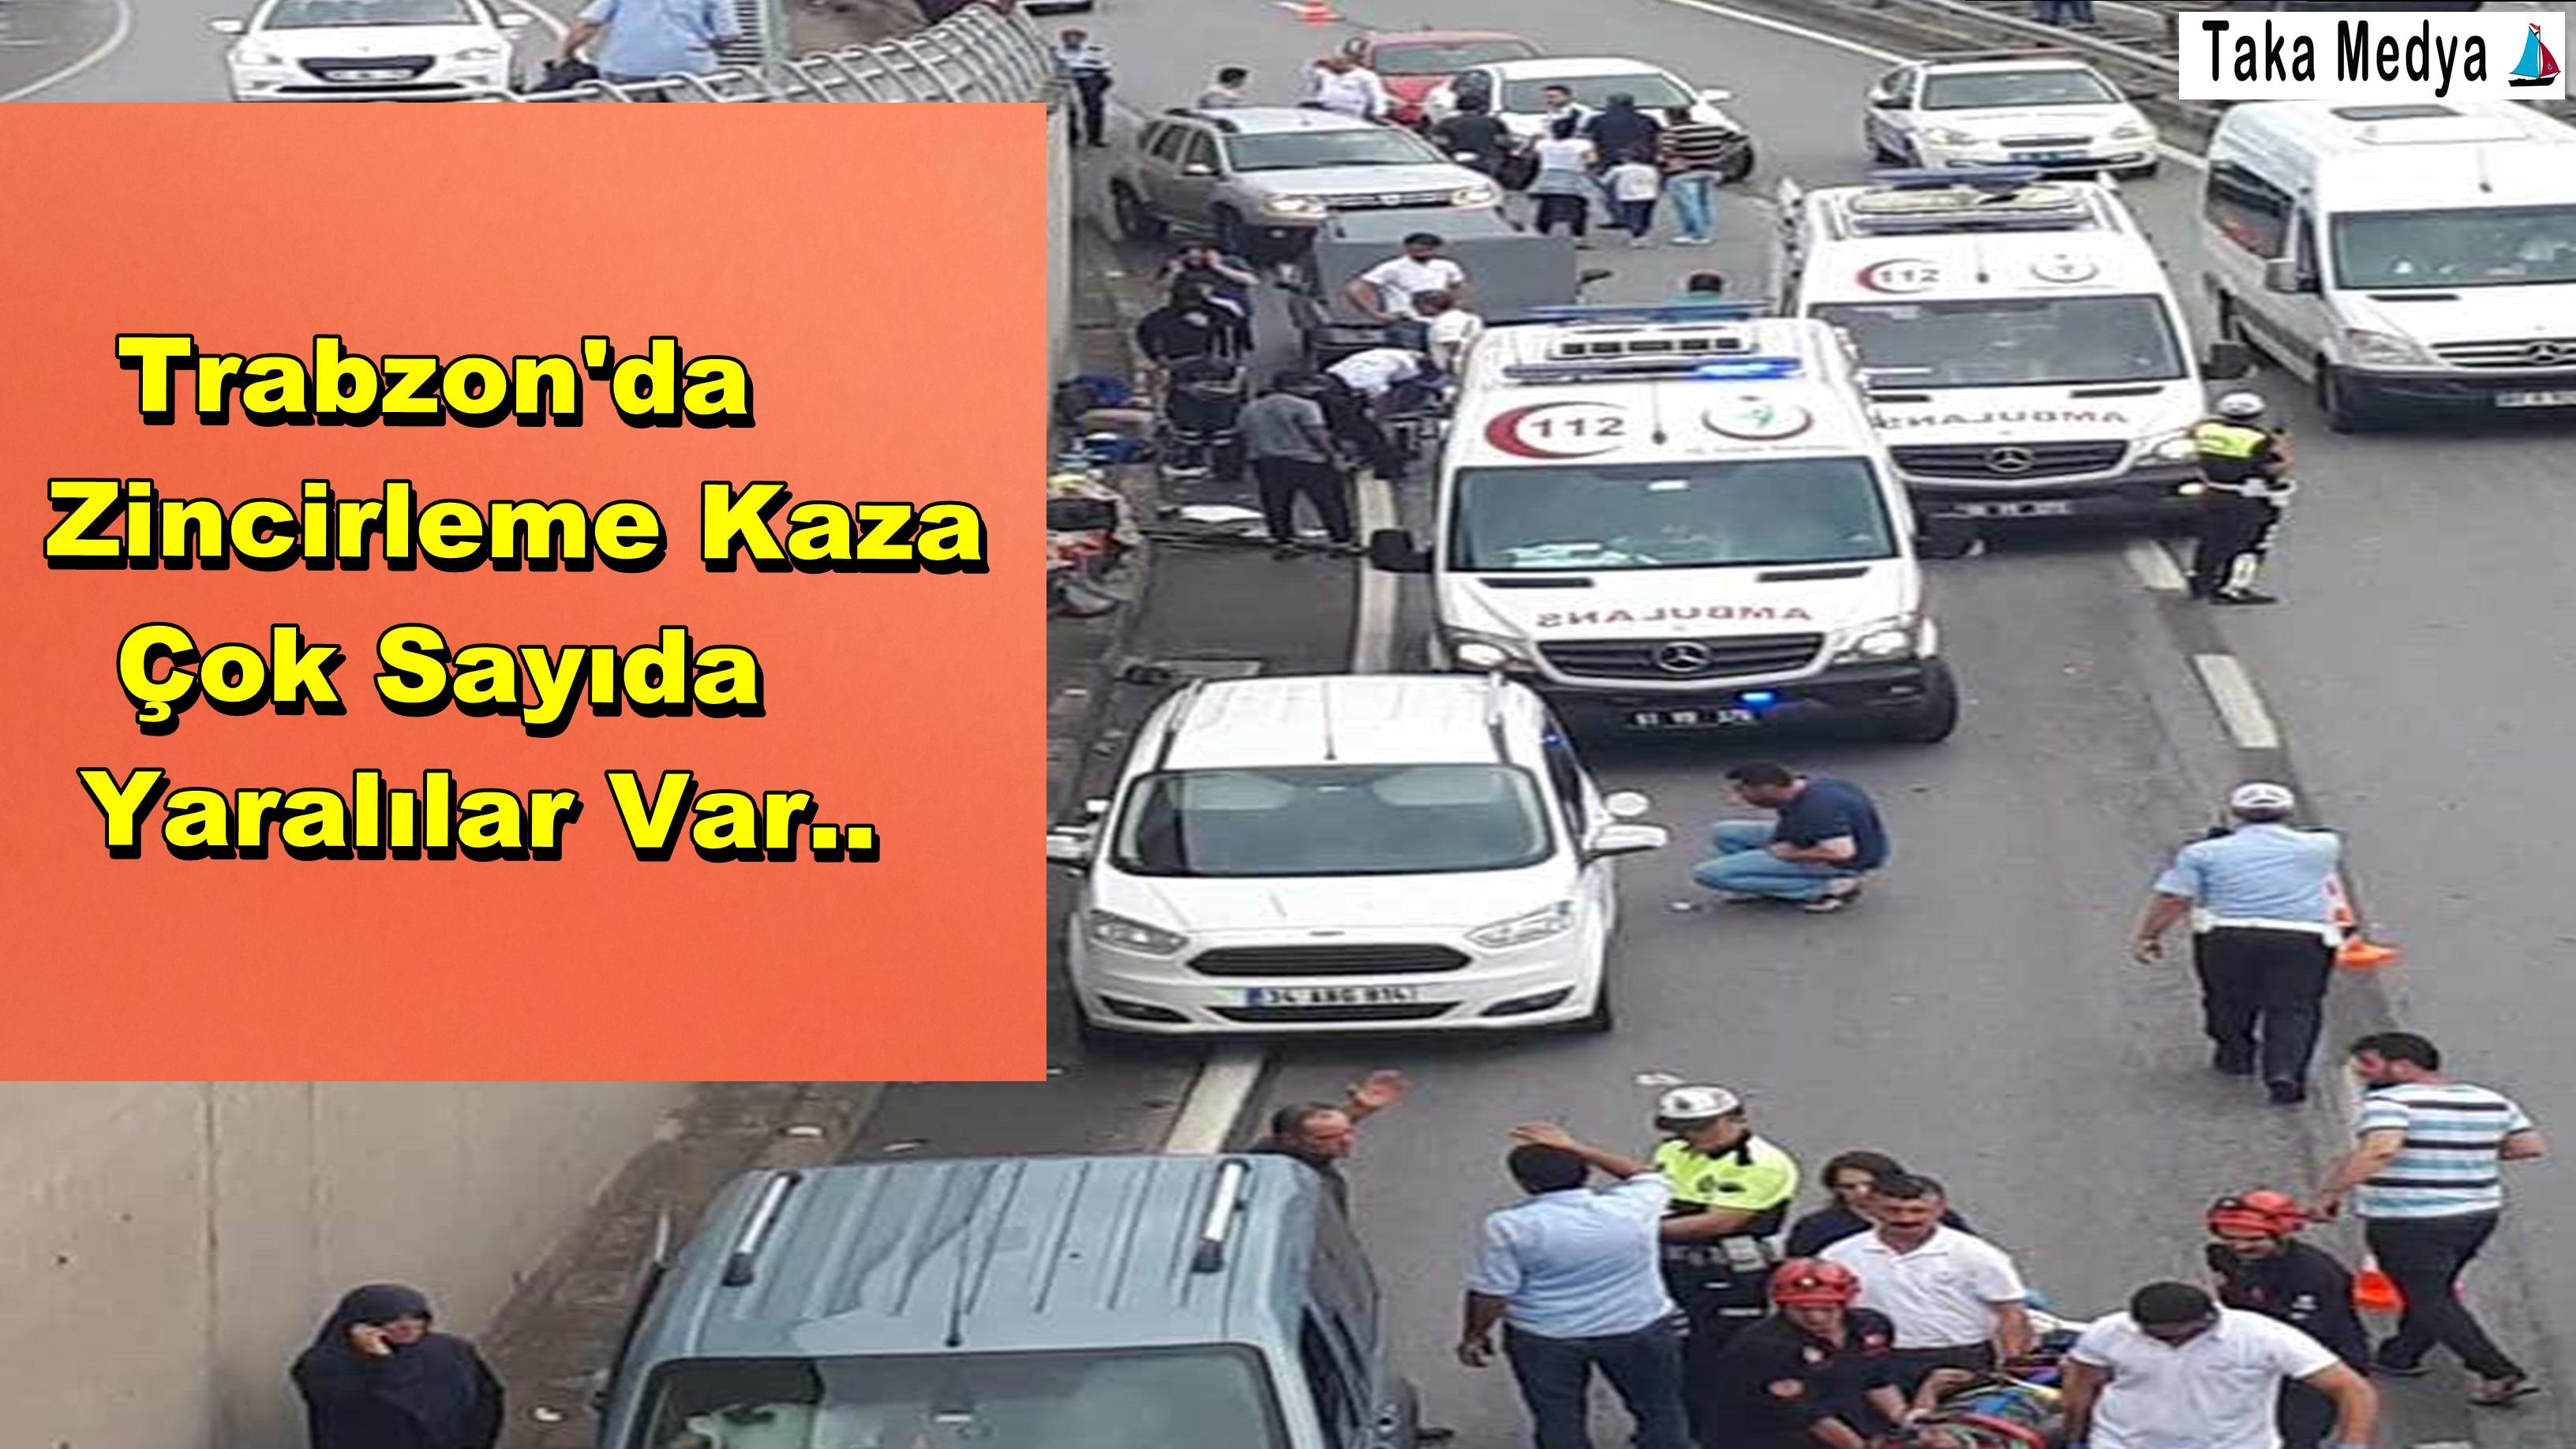 Trabzon'da Kaza Yaralılar Var